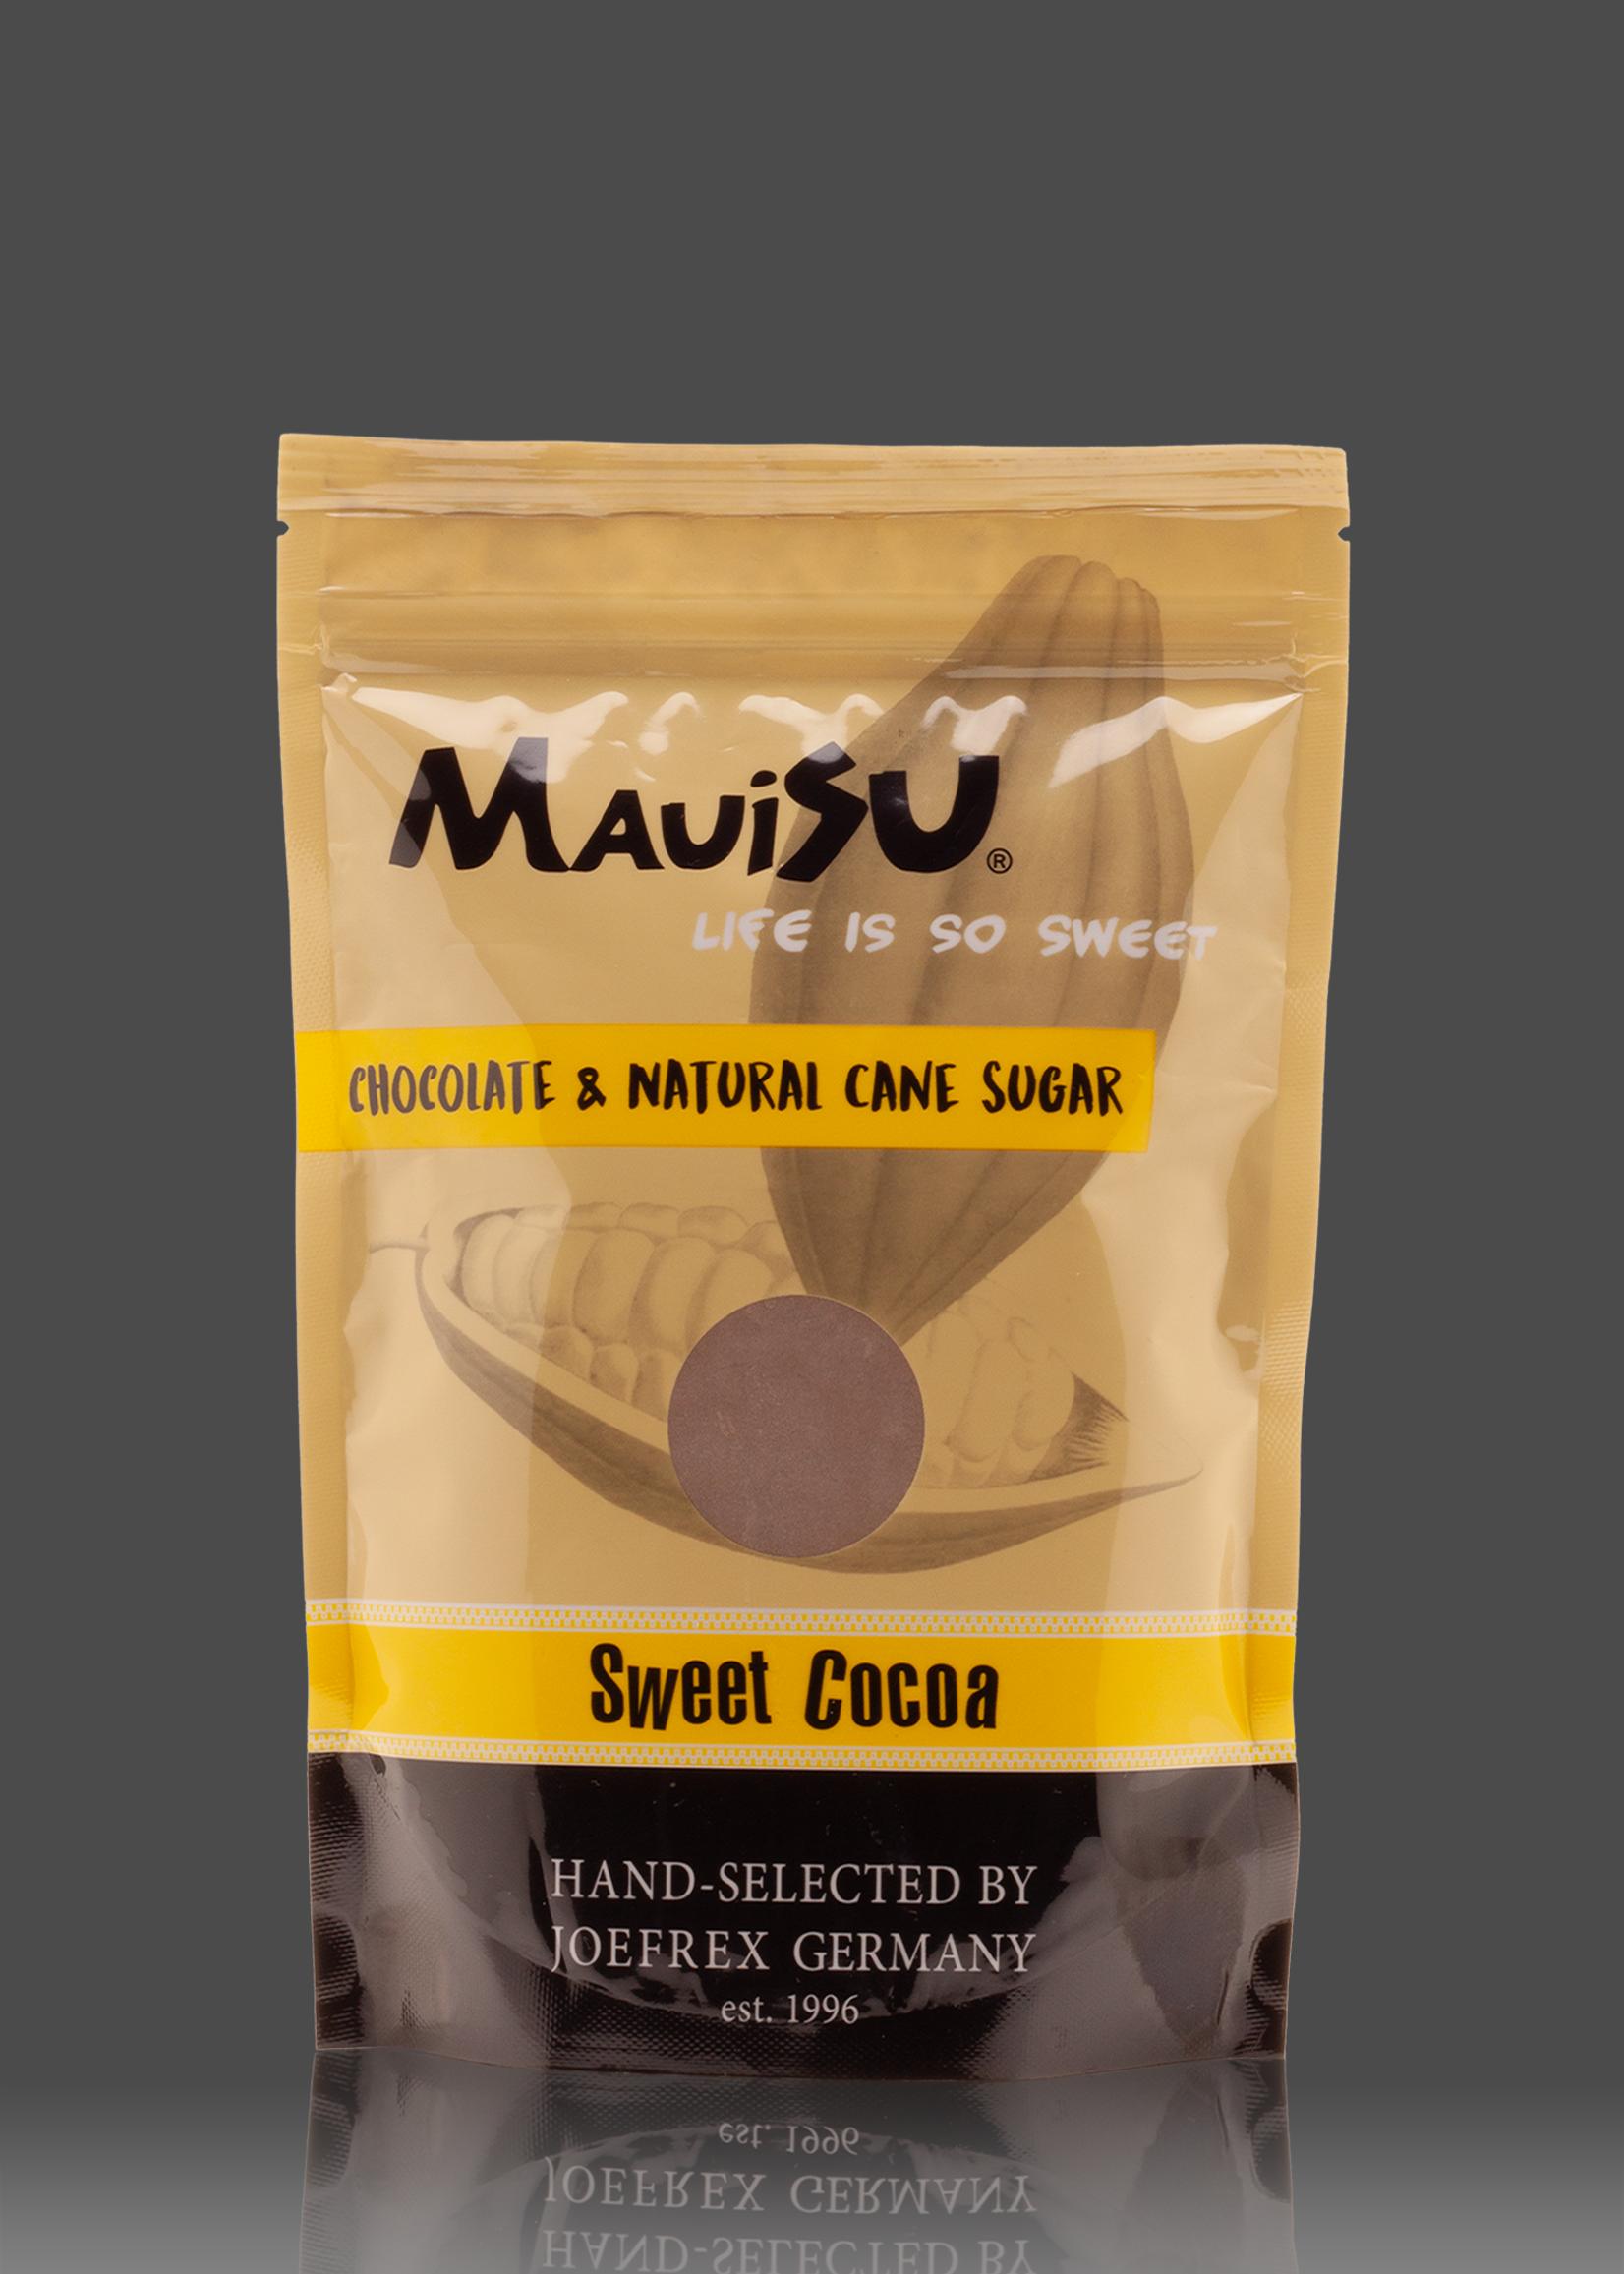 MauiSu drinking chocolate with cane sugar